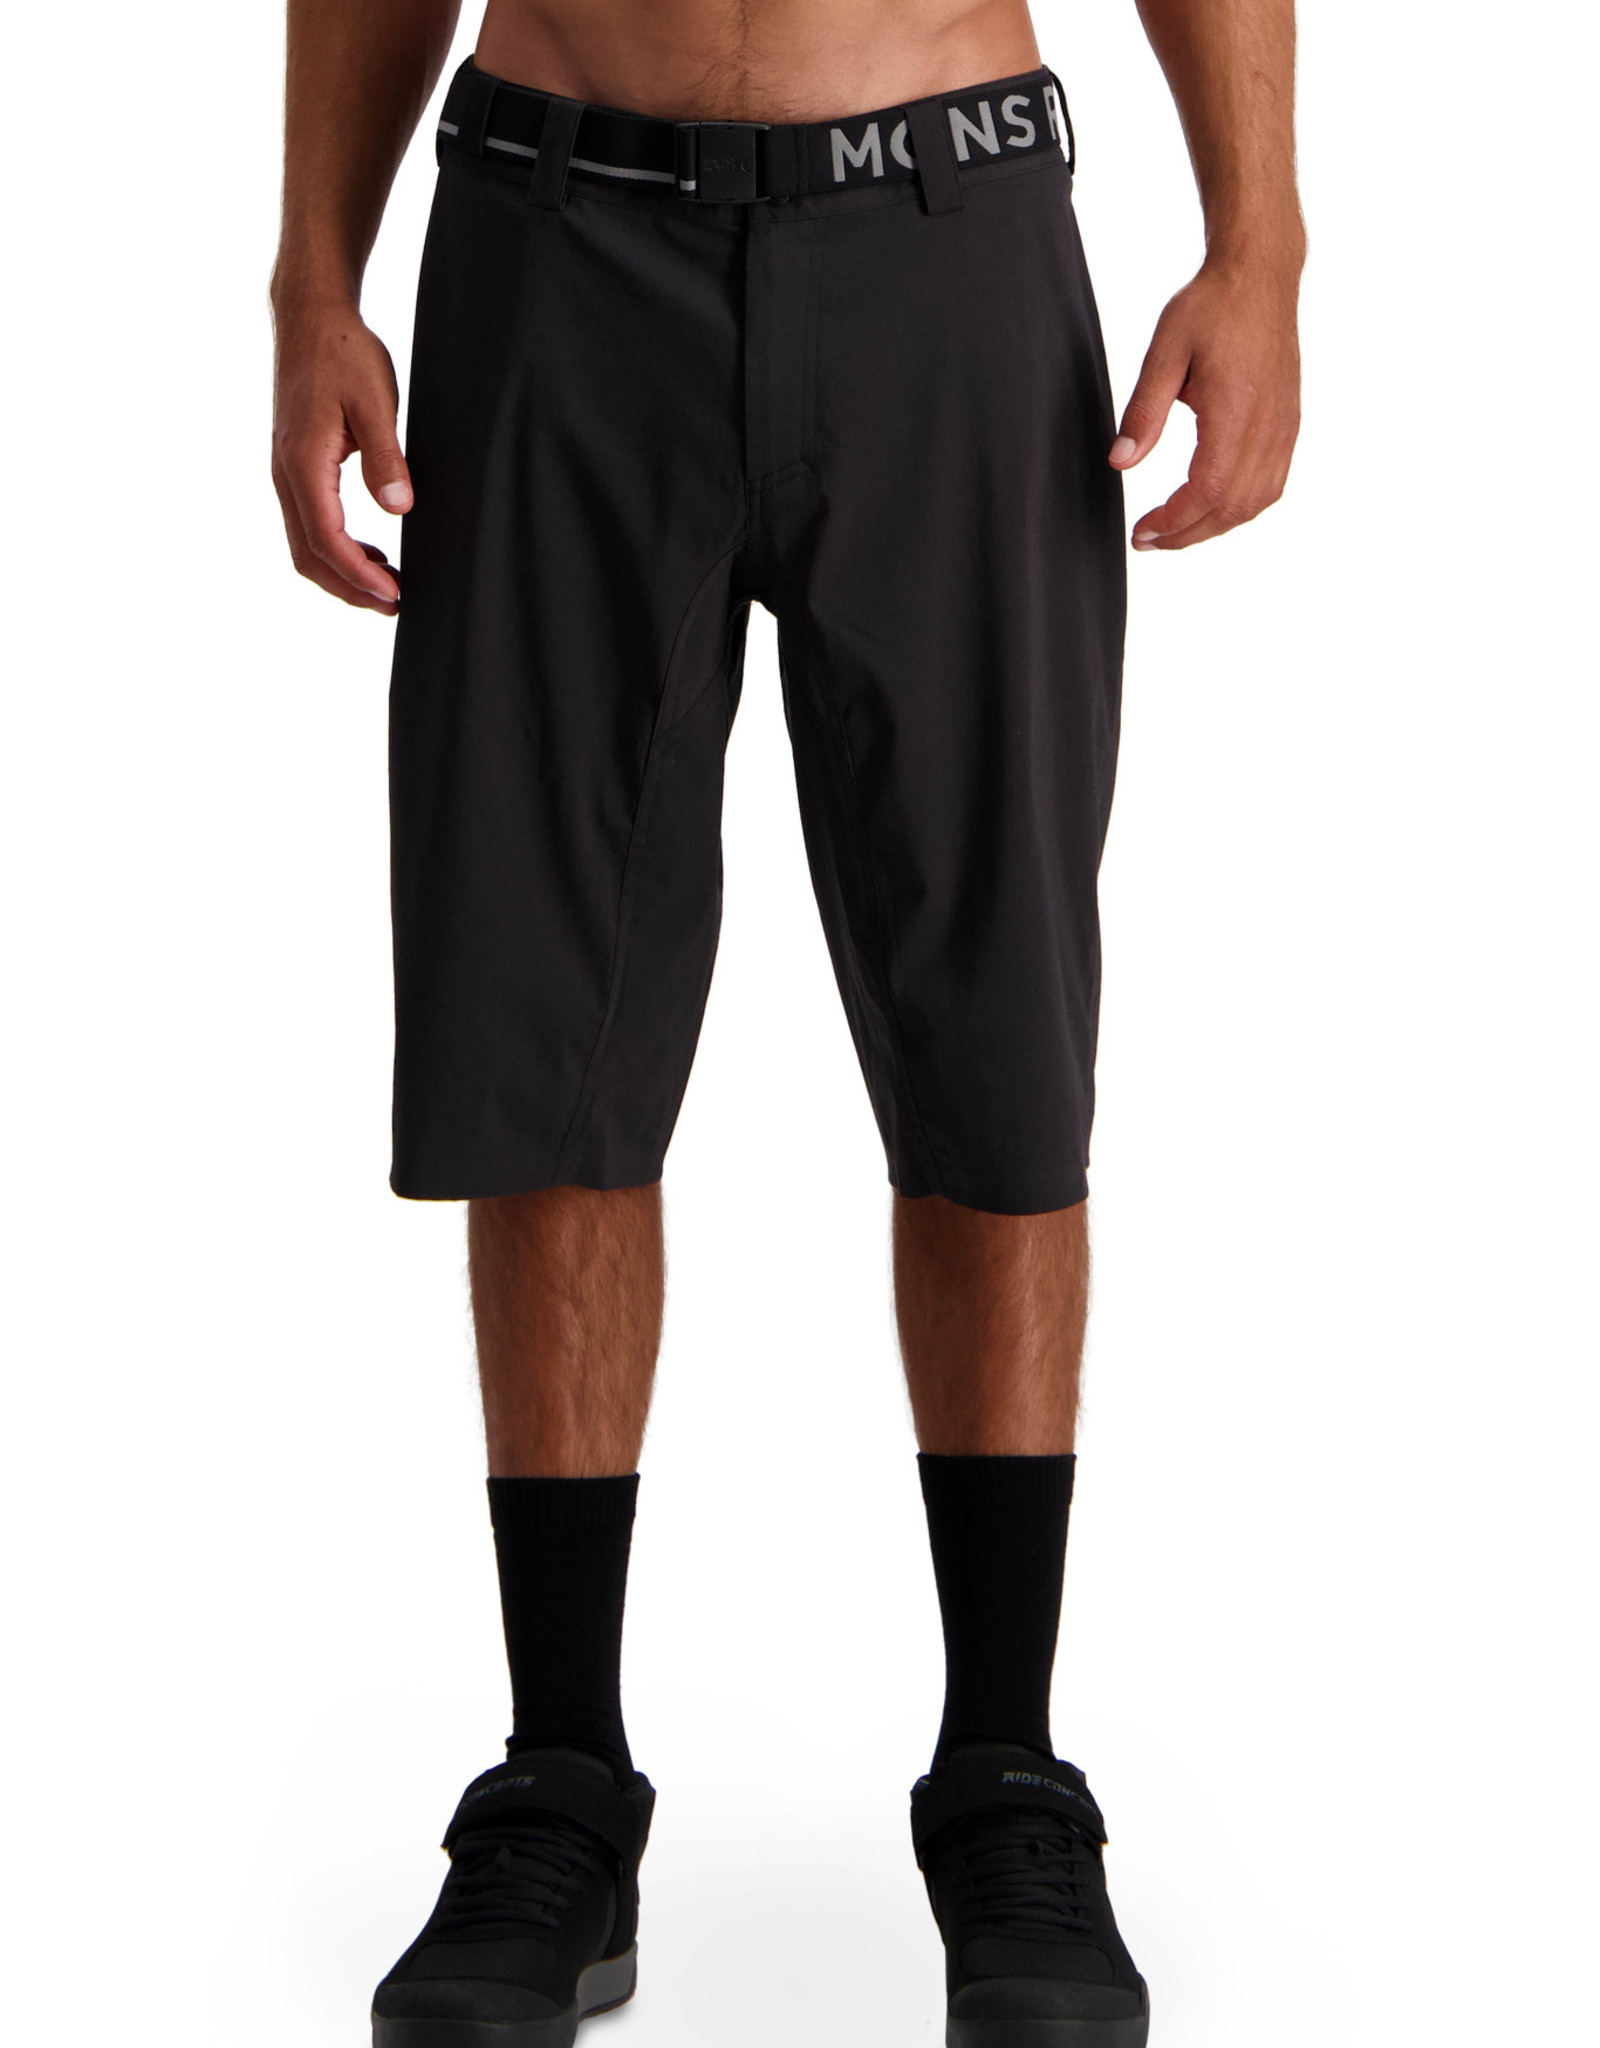 Mons Royale Mons Royale Men's Virage Bike Shorts -S2021